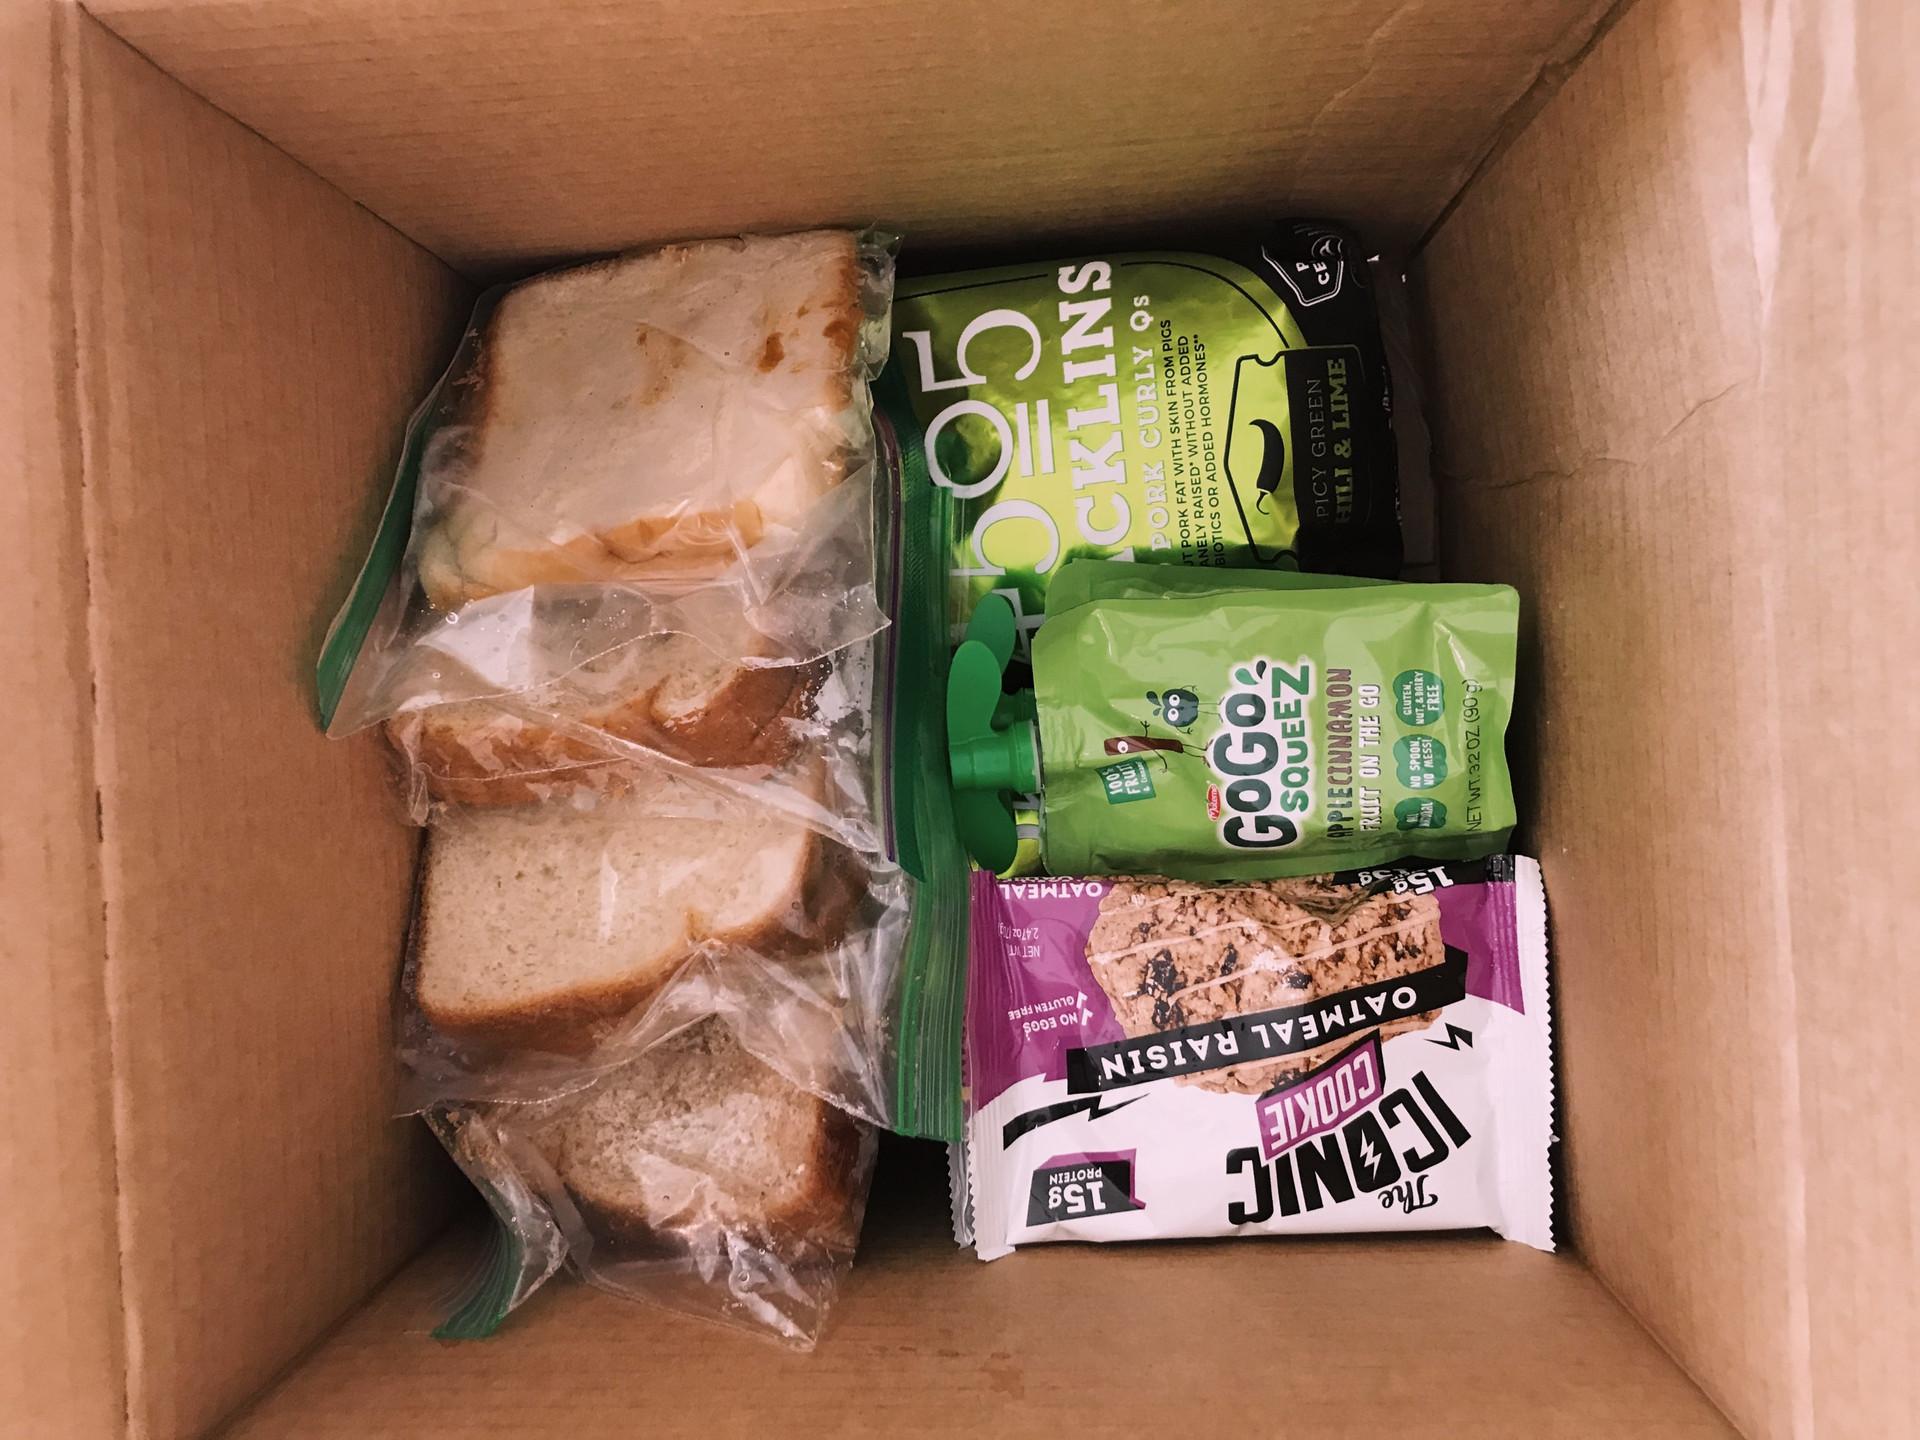 weekly box using donated goods